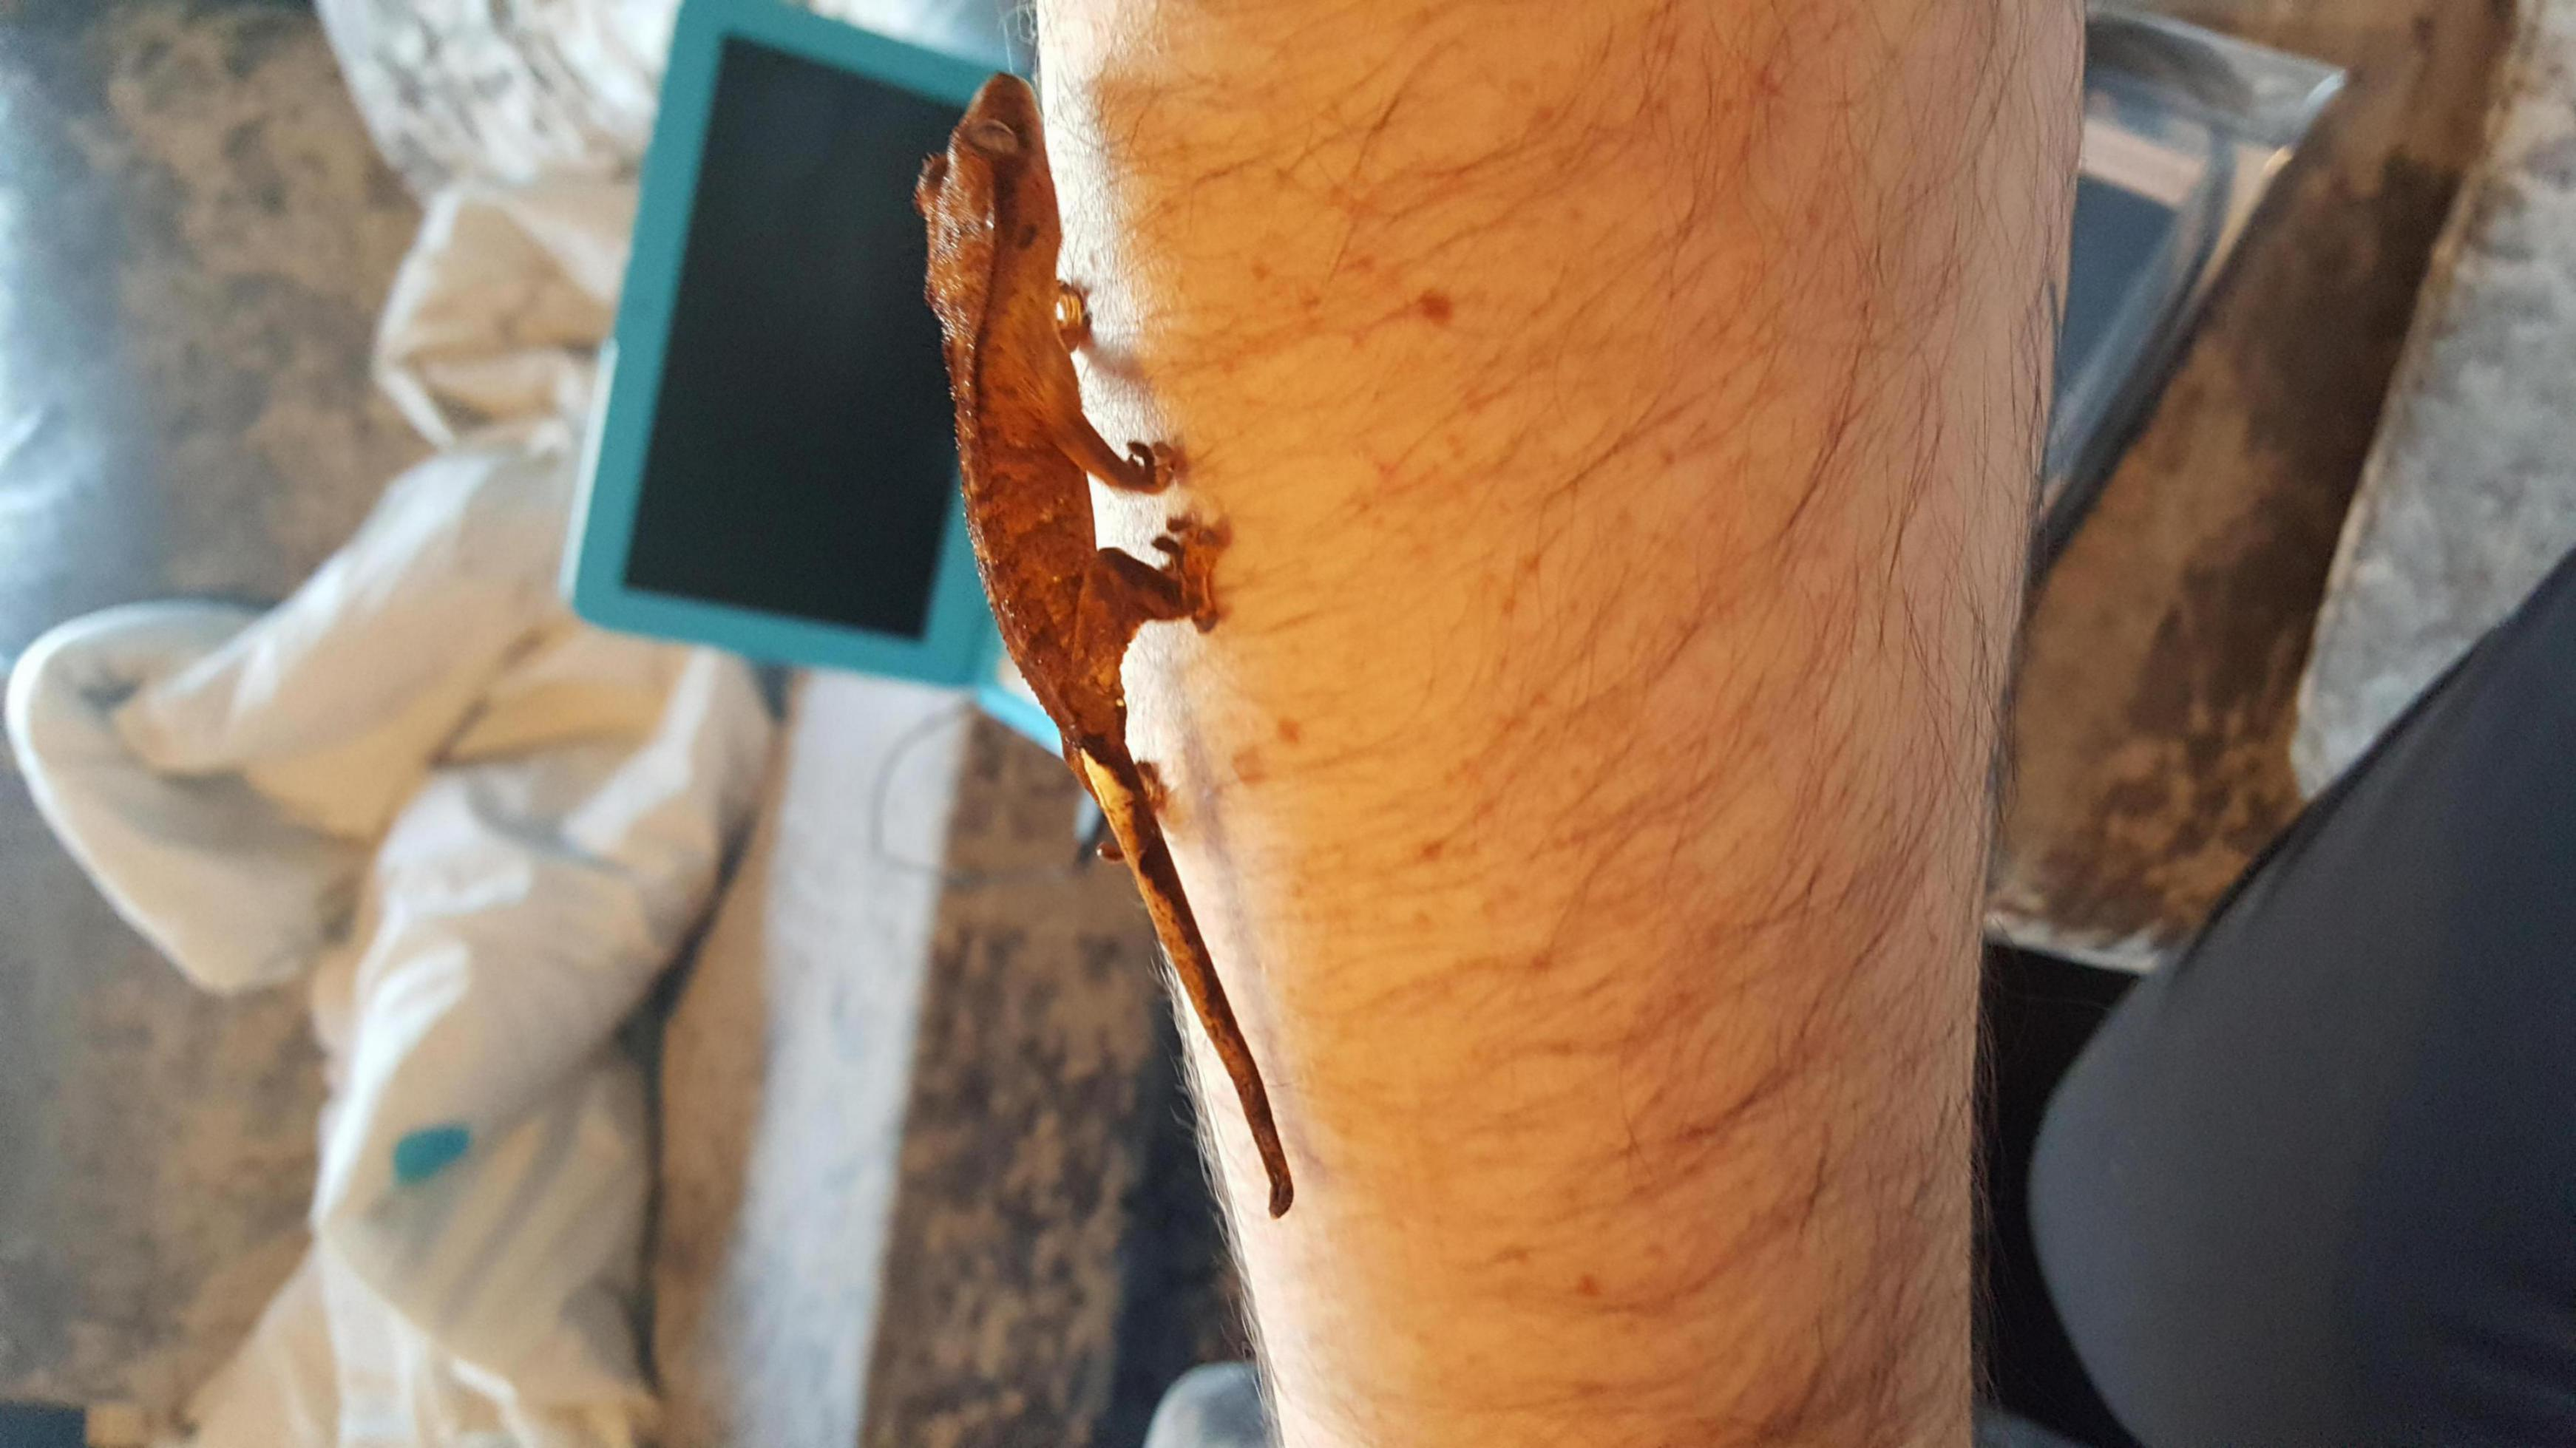 New Crested gecko-20180122_144736_1517089920365.jpg